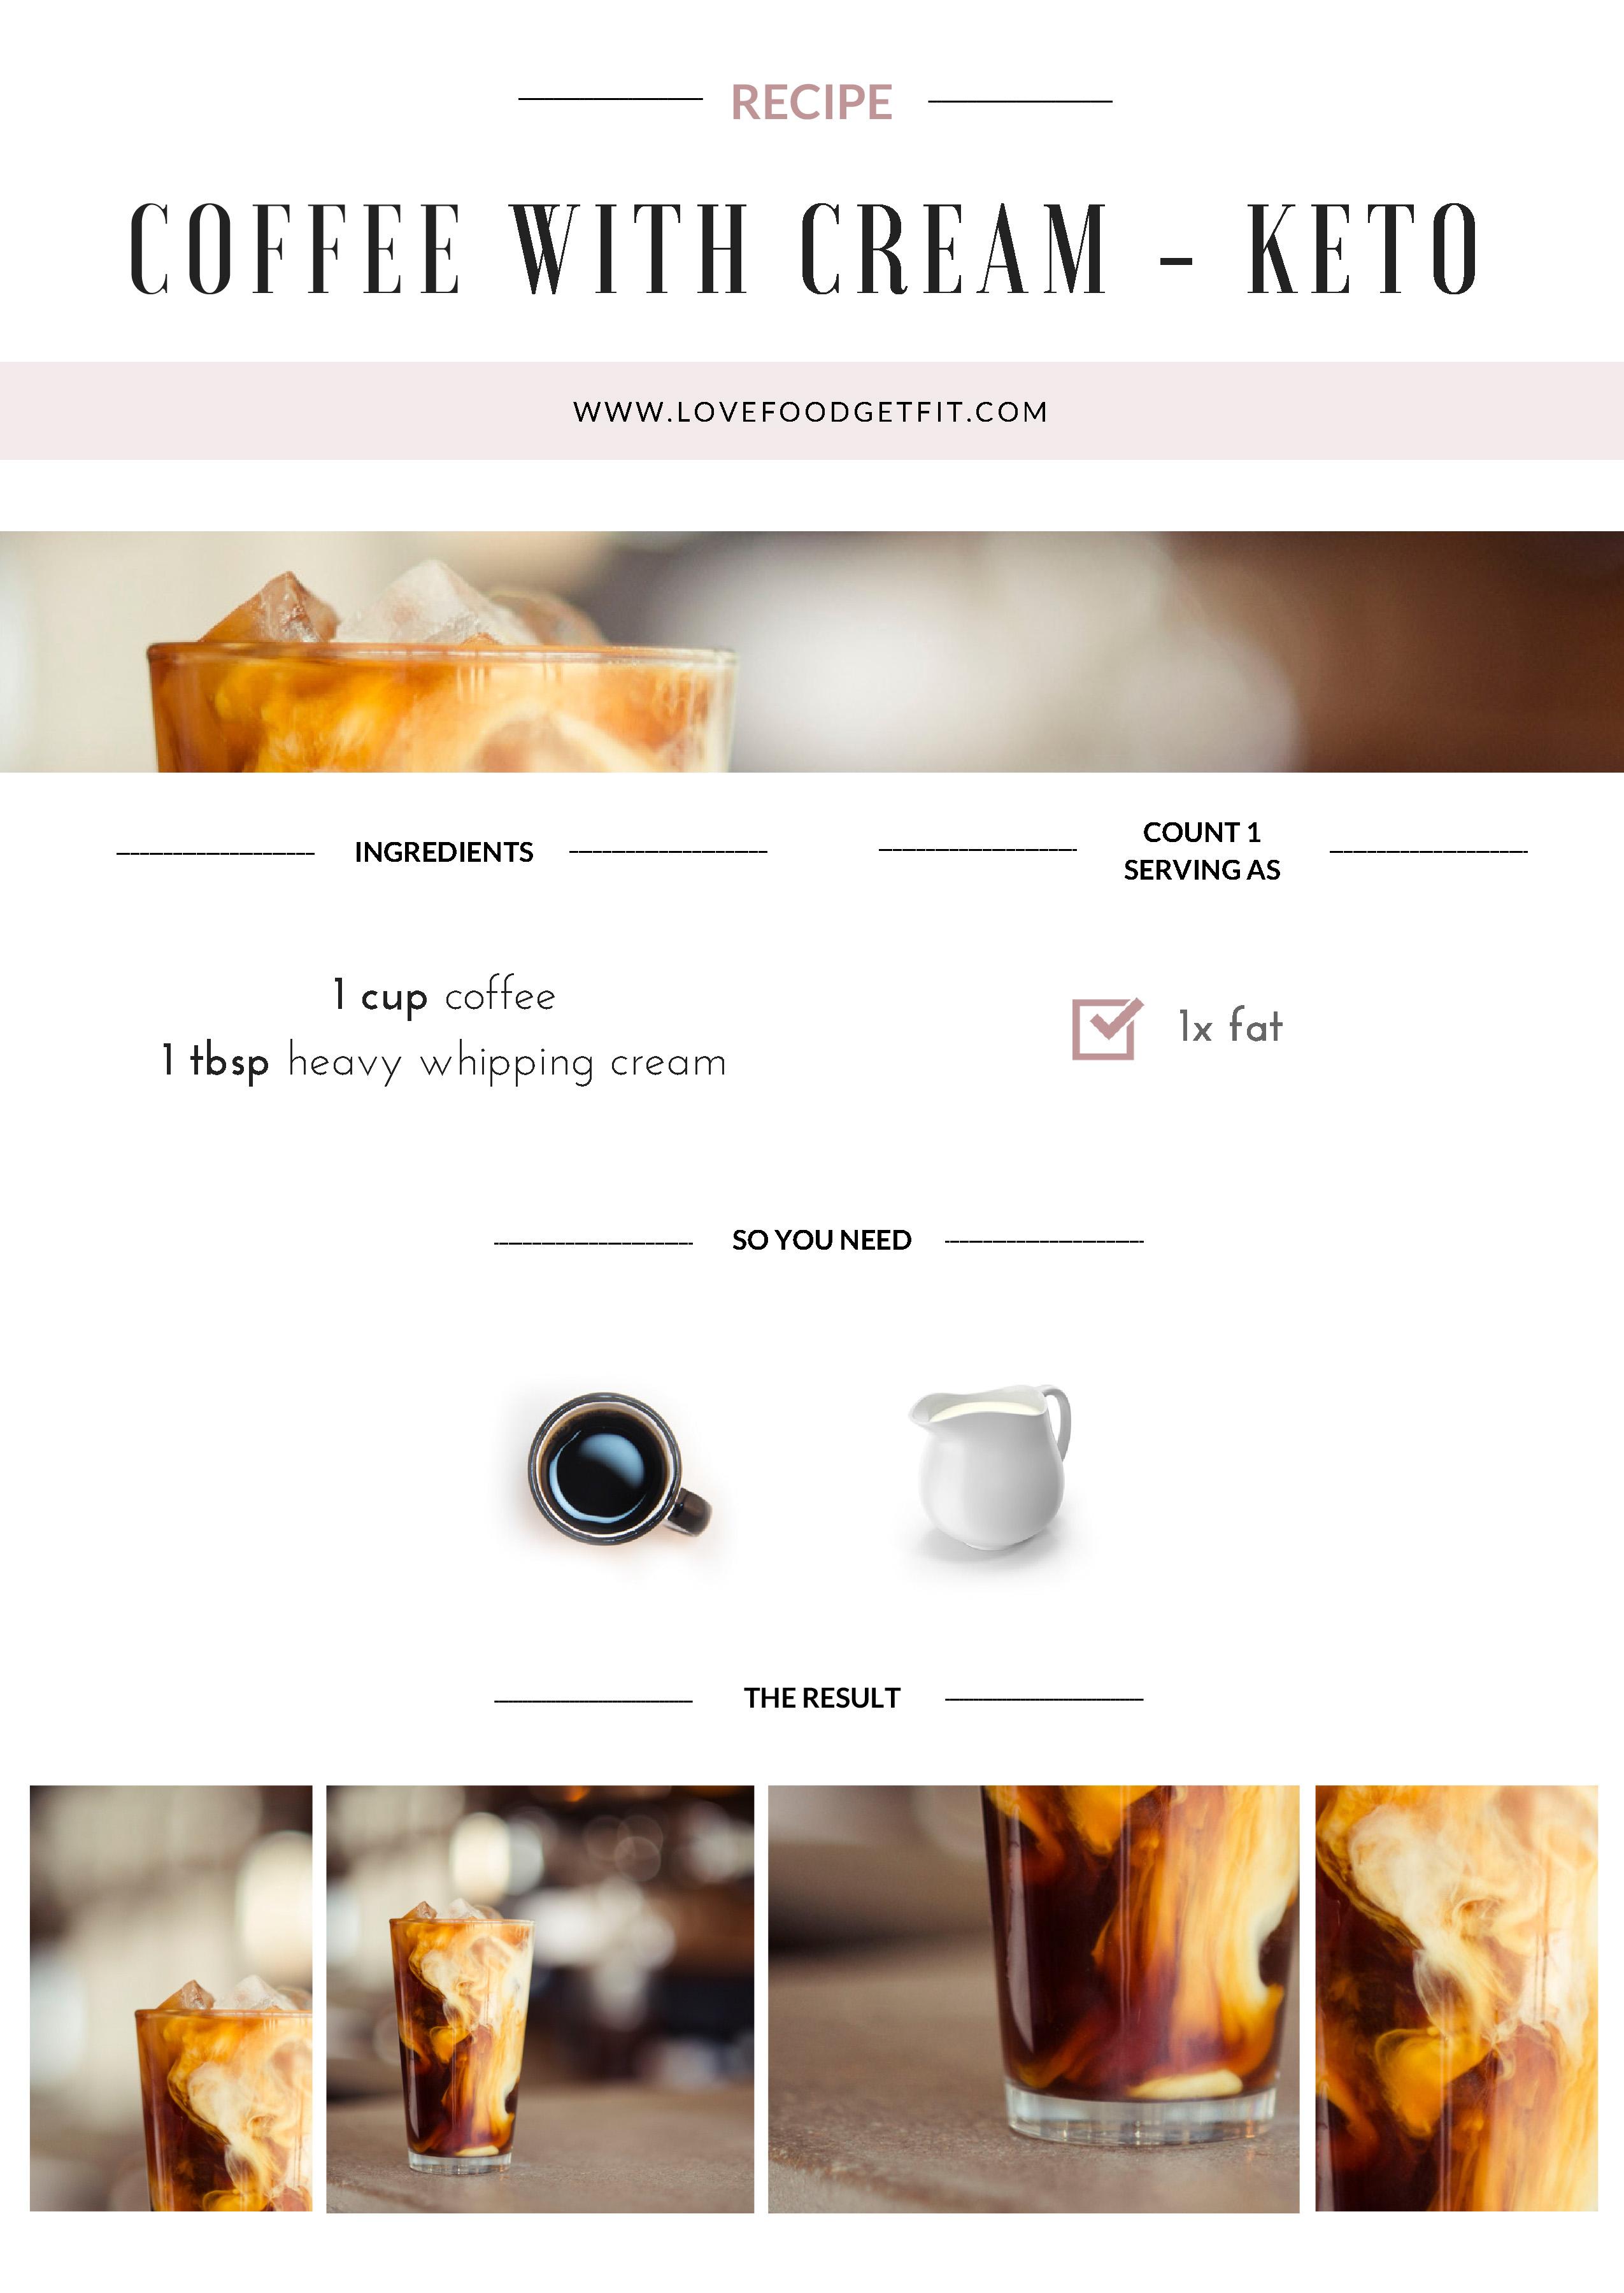 coffee with cream recipe card